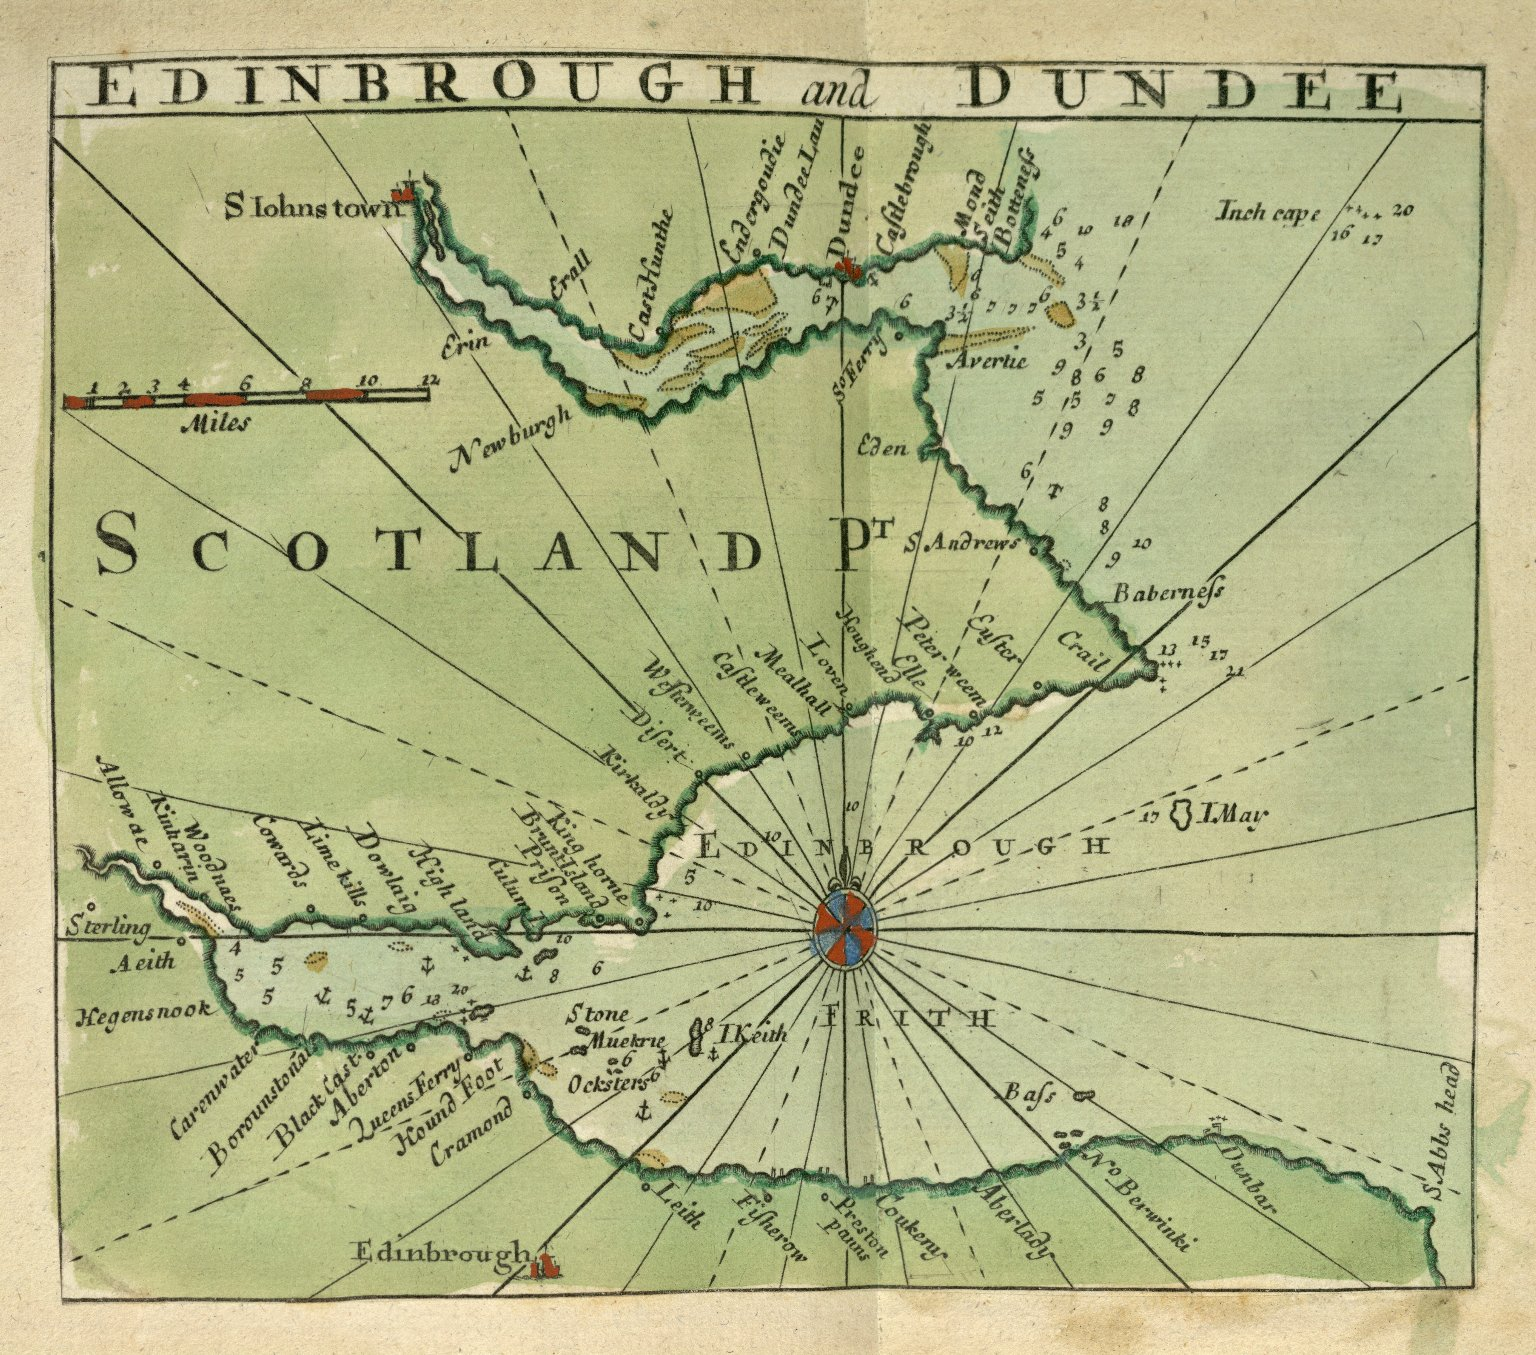 Edinbrough and Dundee [1 of 1]